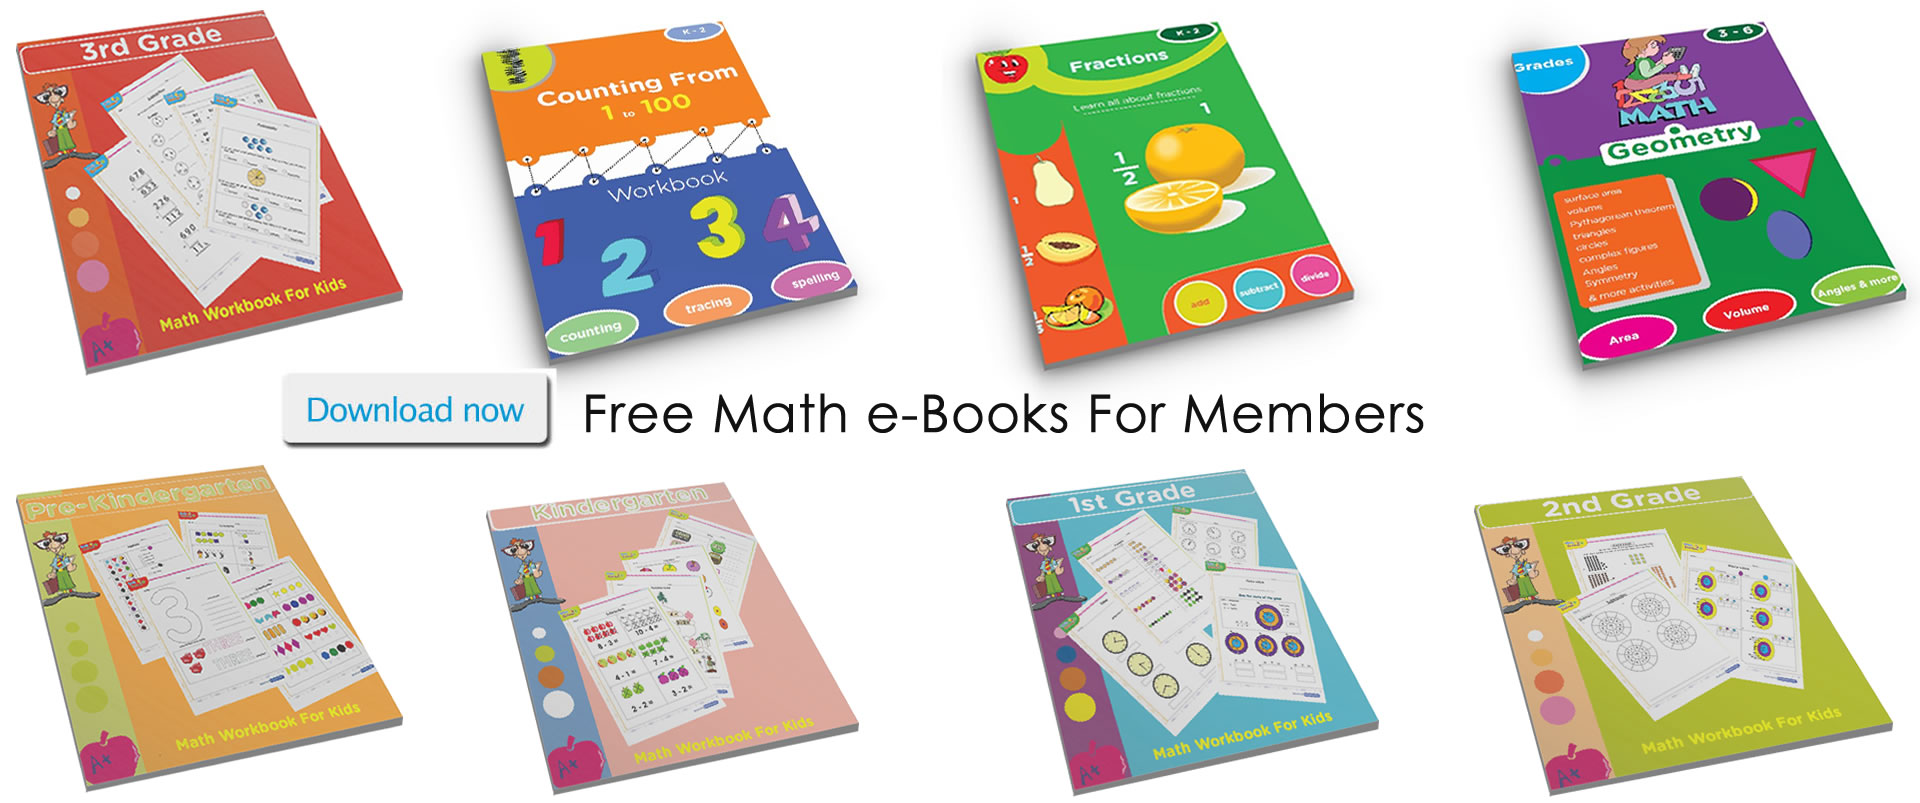 Math Video Tutorials For Kids Pre K Kindergarten 1st Grade 2nd Grade 3rd Grade 4th Grade